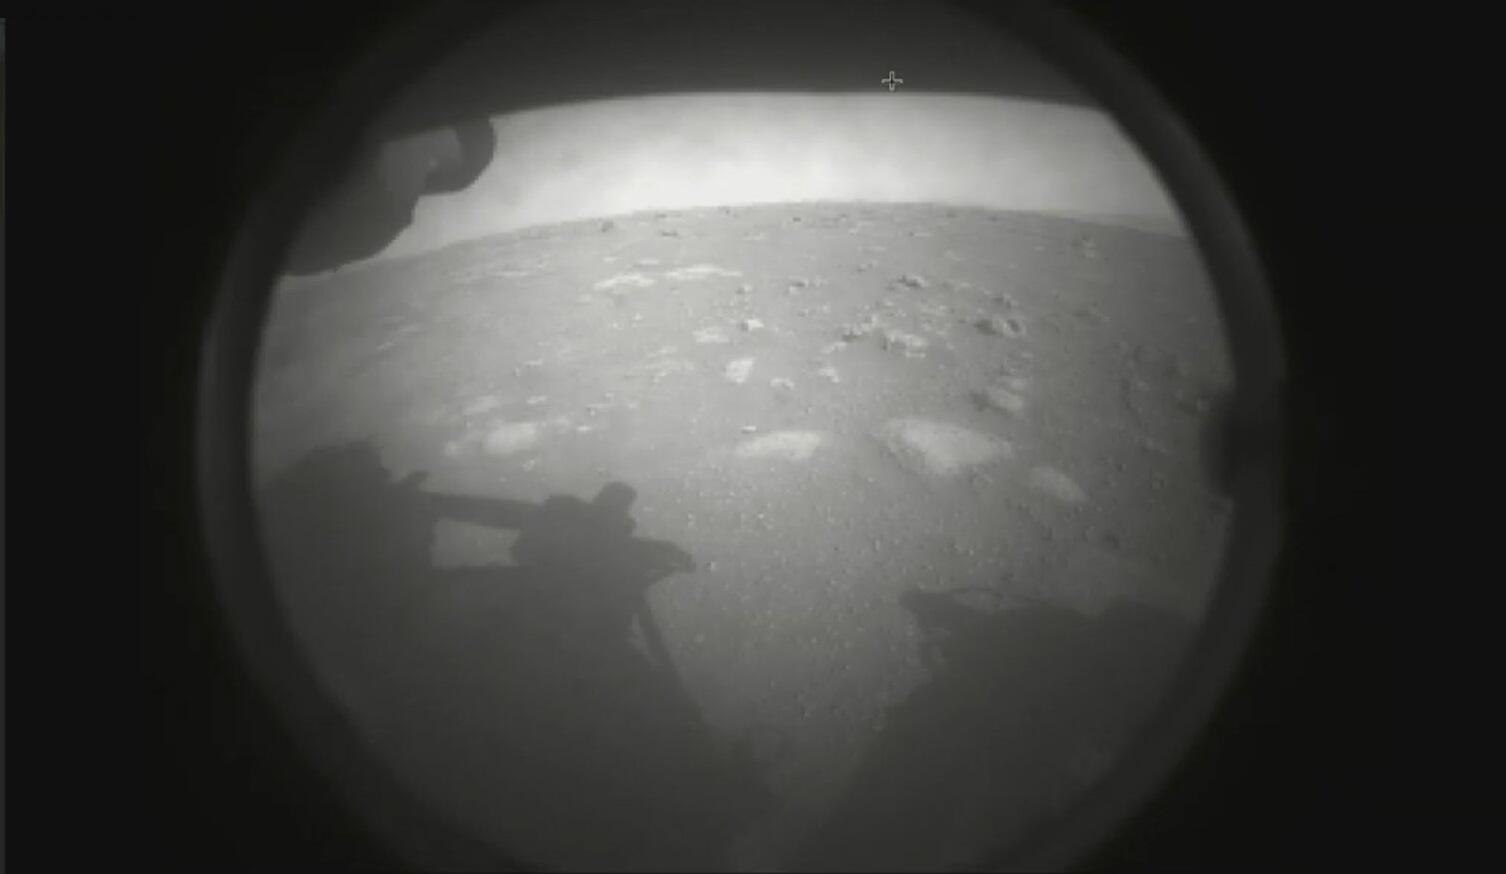 2021-02-19 mars exploration space nasa perseverance rover